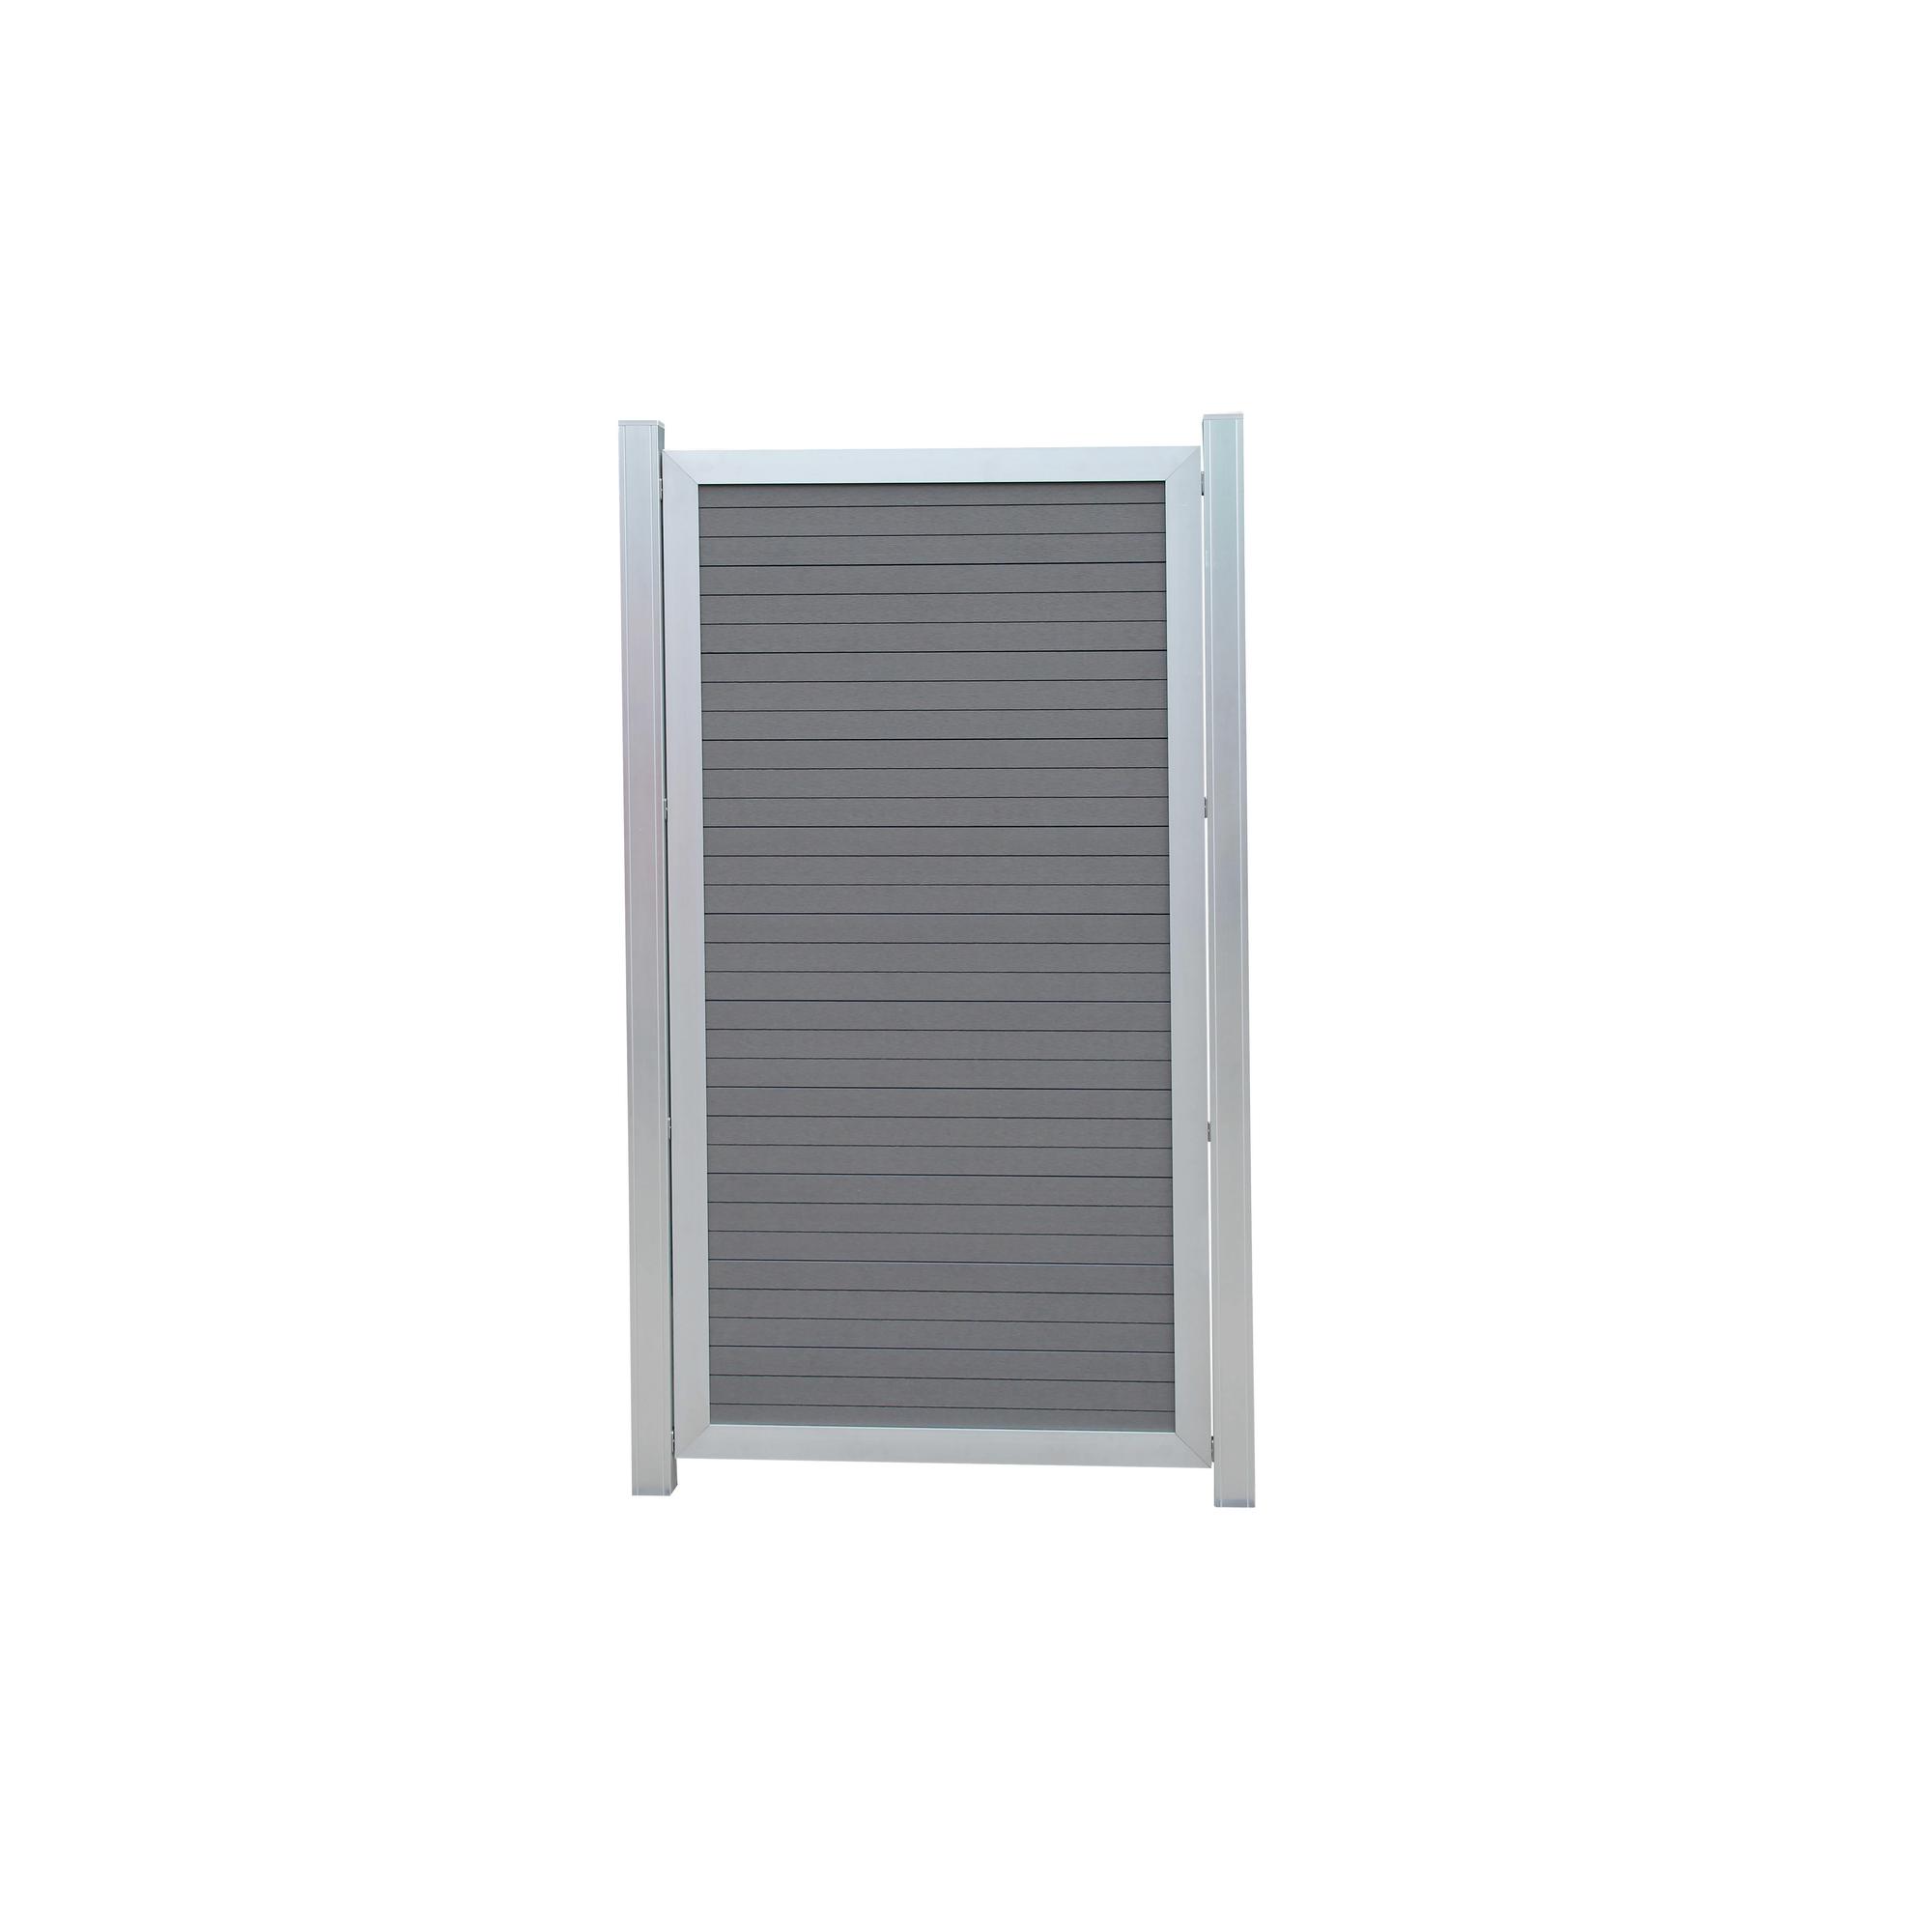 Wpc Zaun Halbelement Aluminiumrahmen 90 X 175 Cm ǀ Toom Baumarkt